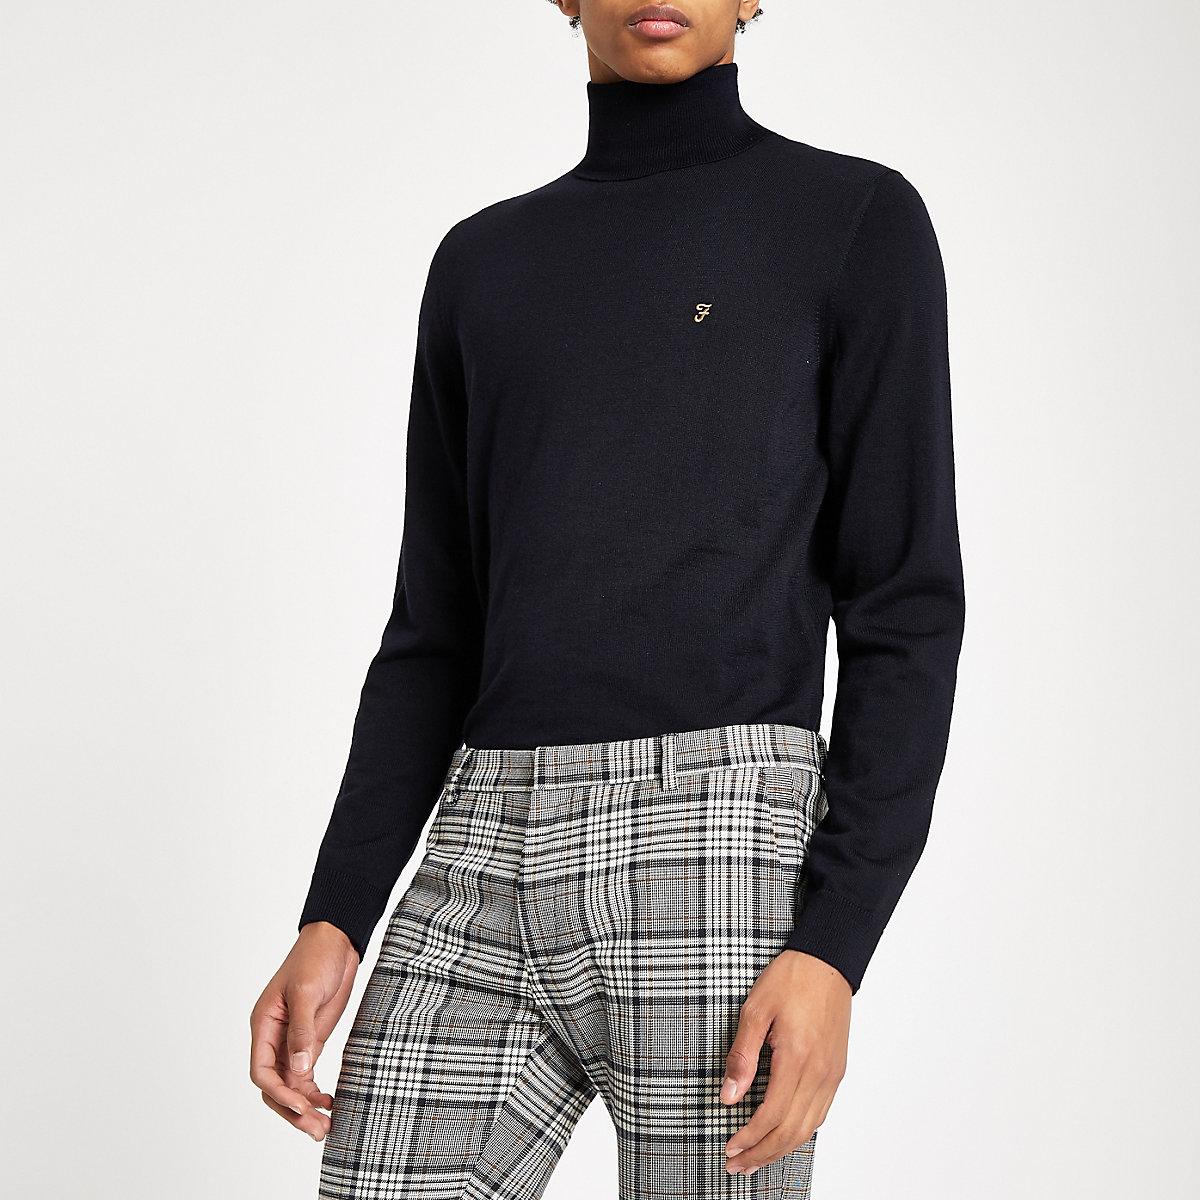 Farah navy roll neck sweater